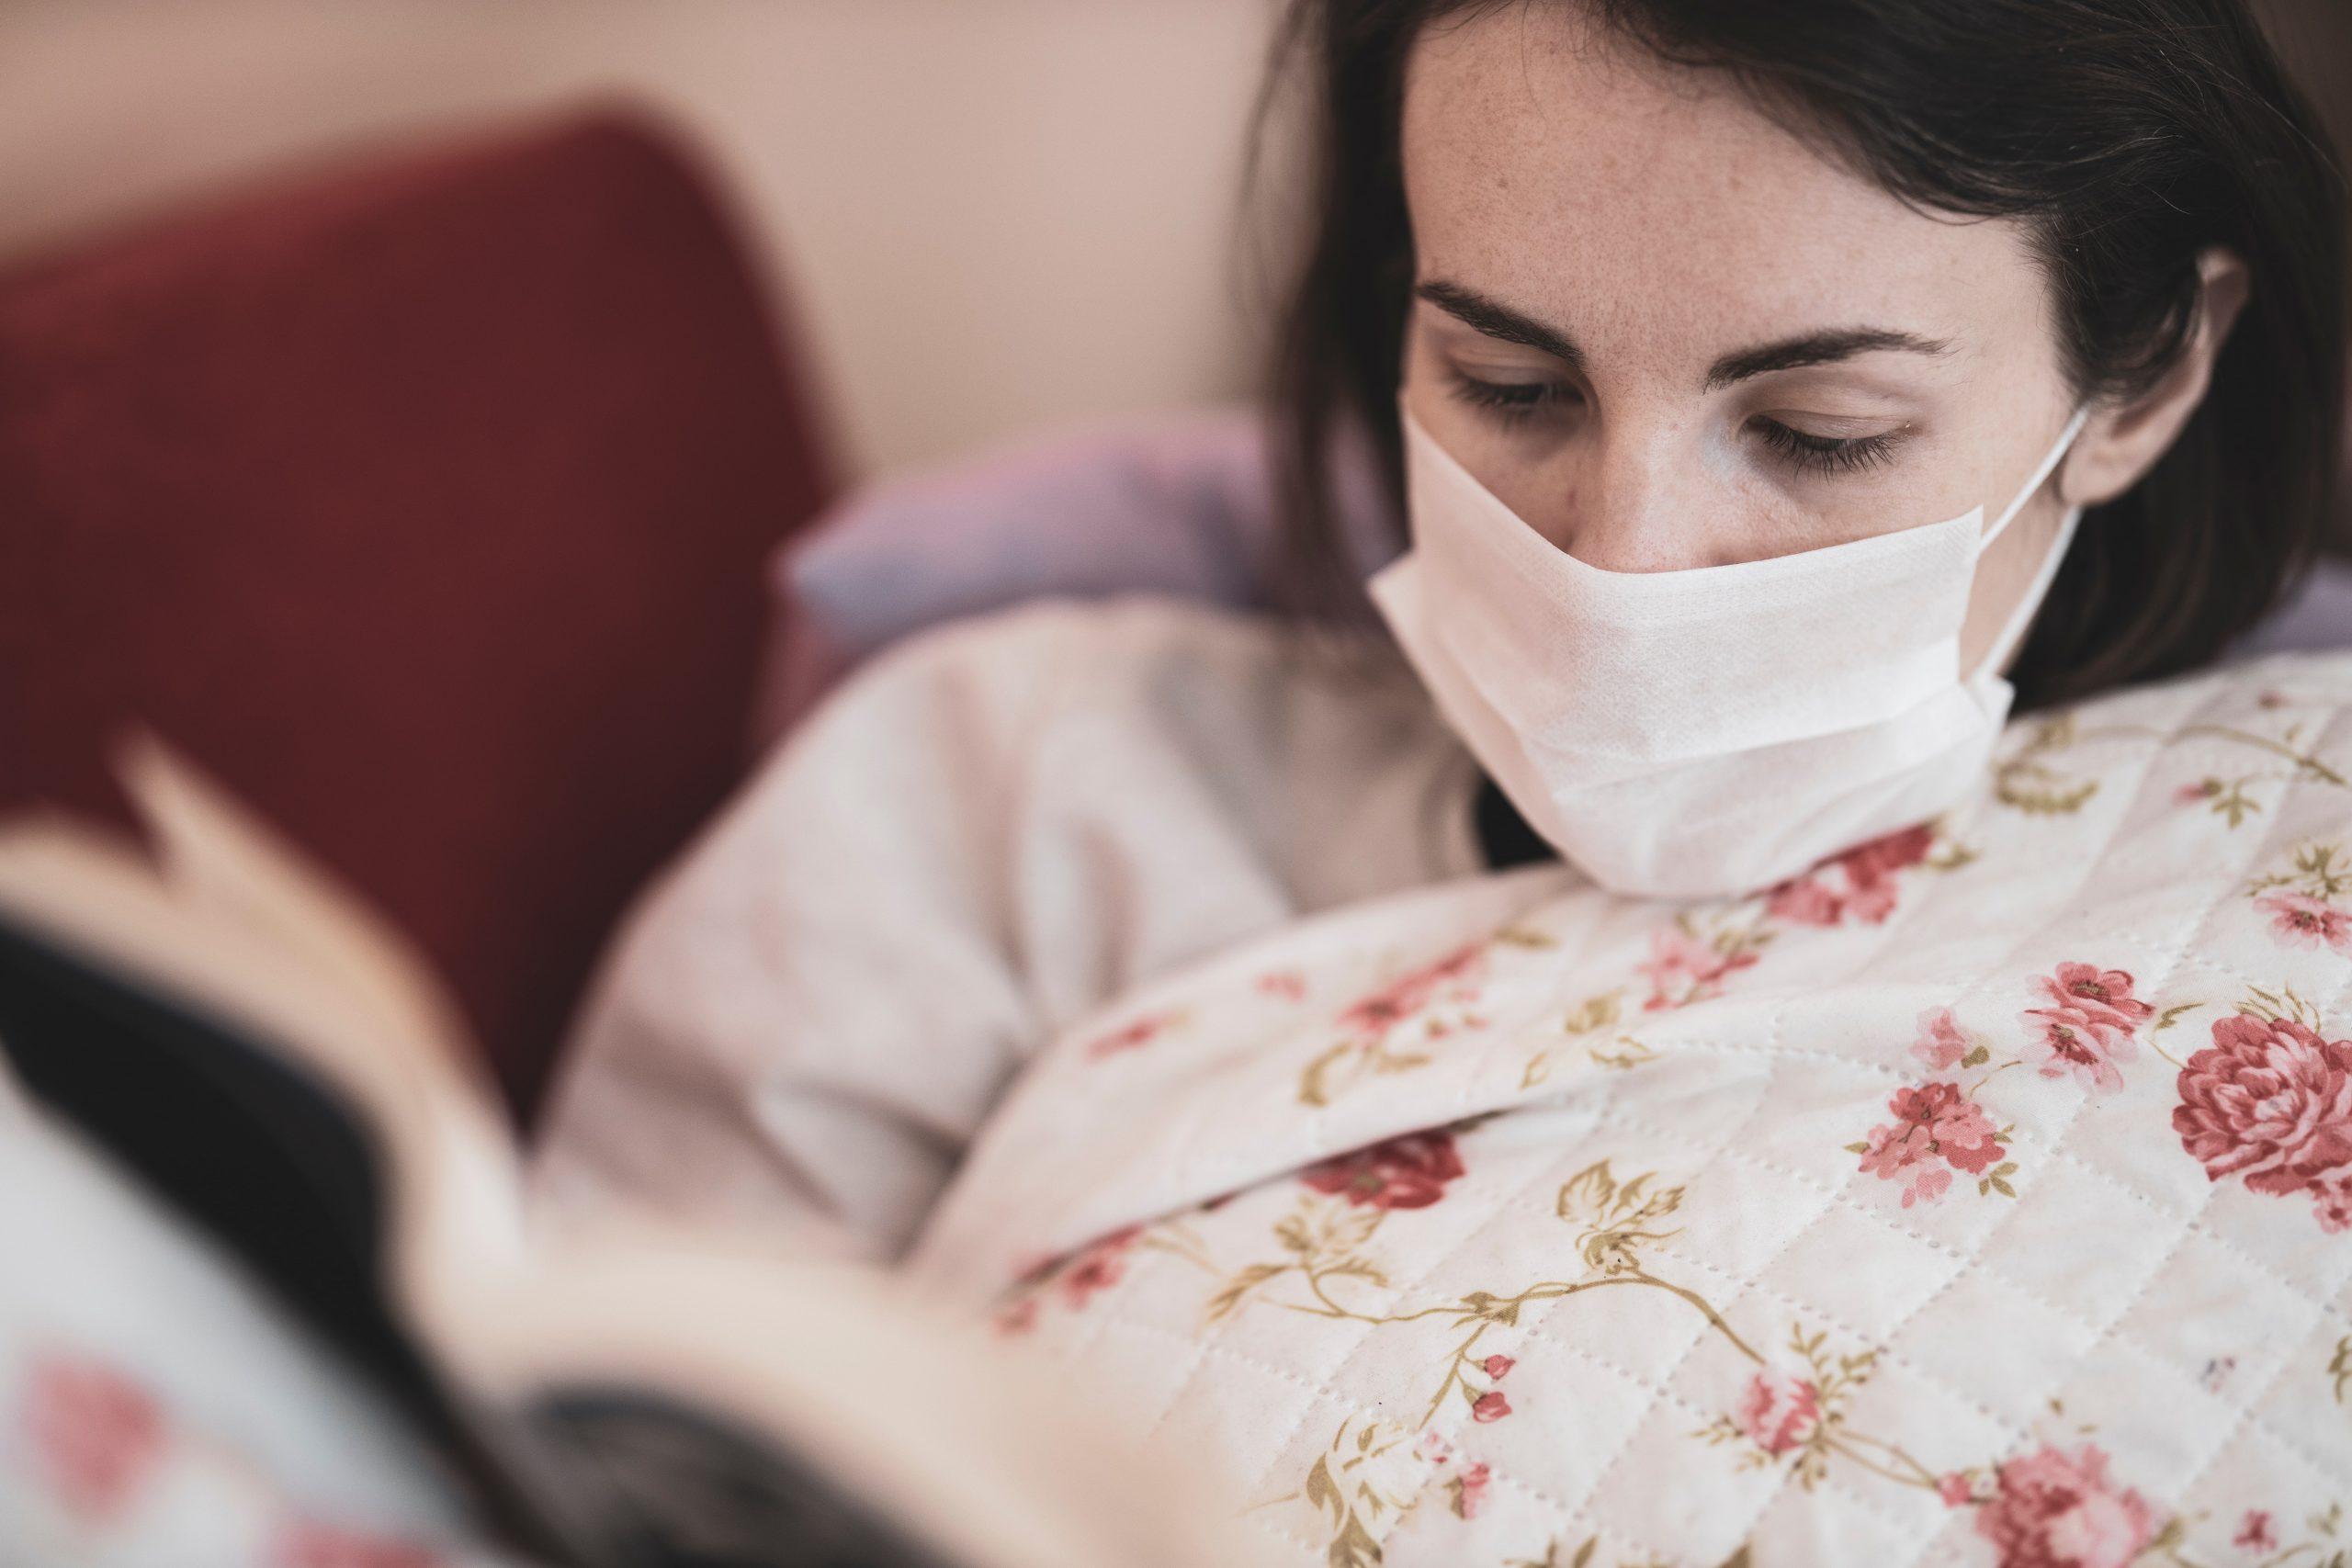 Blood Cancer Patient Self-Care Quarantine